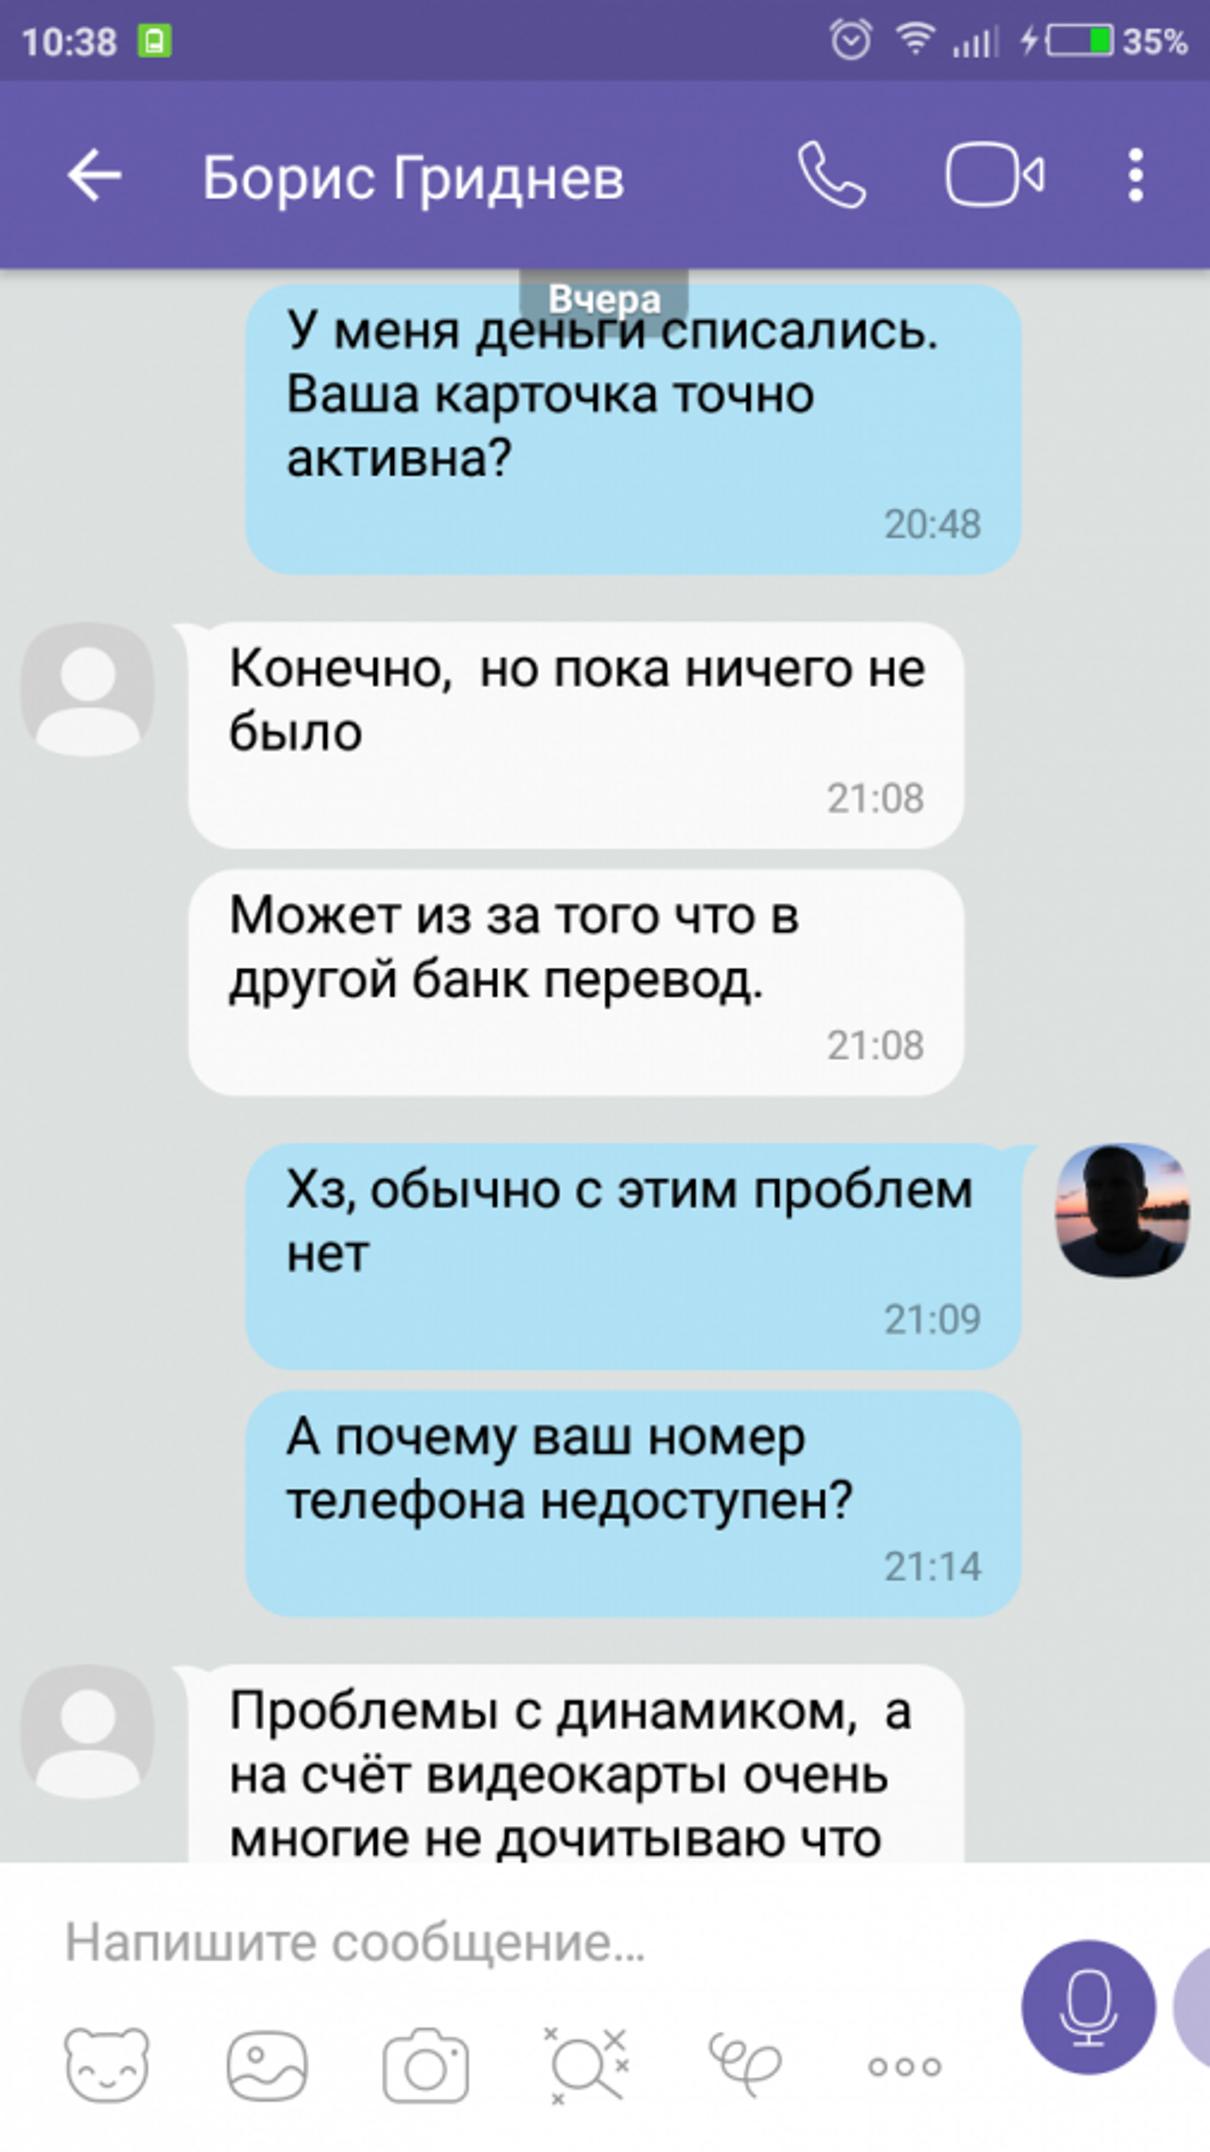 Жалоба-отзыв: Борис Гриднев - Мошенник с OLX, кидает на предоплату.  Фото №4